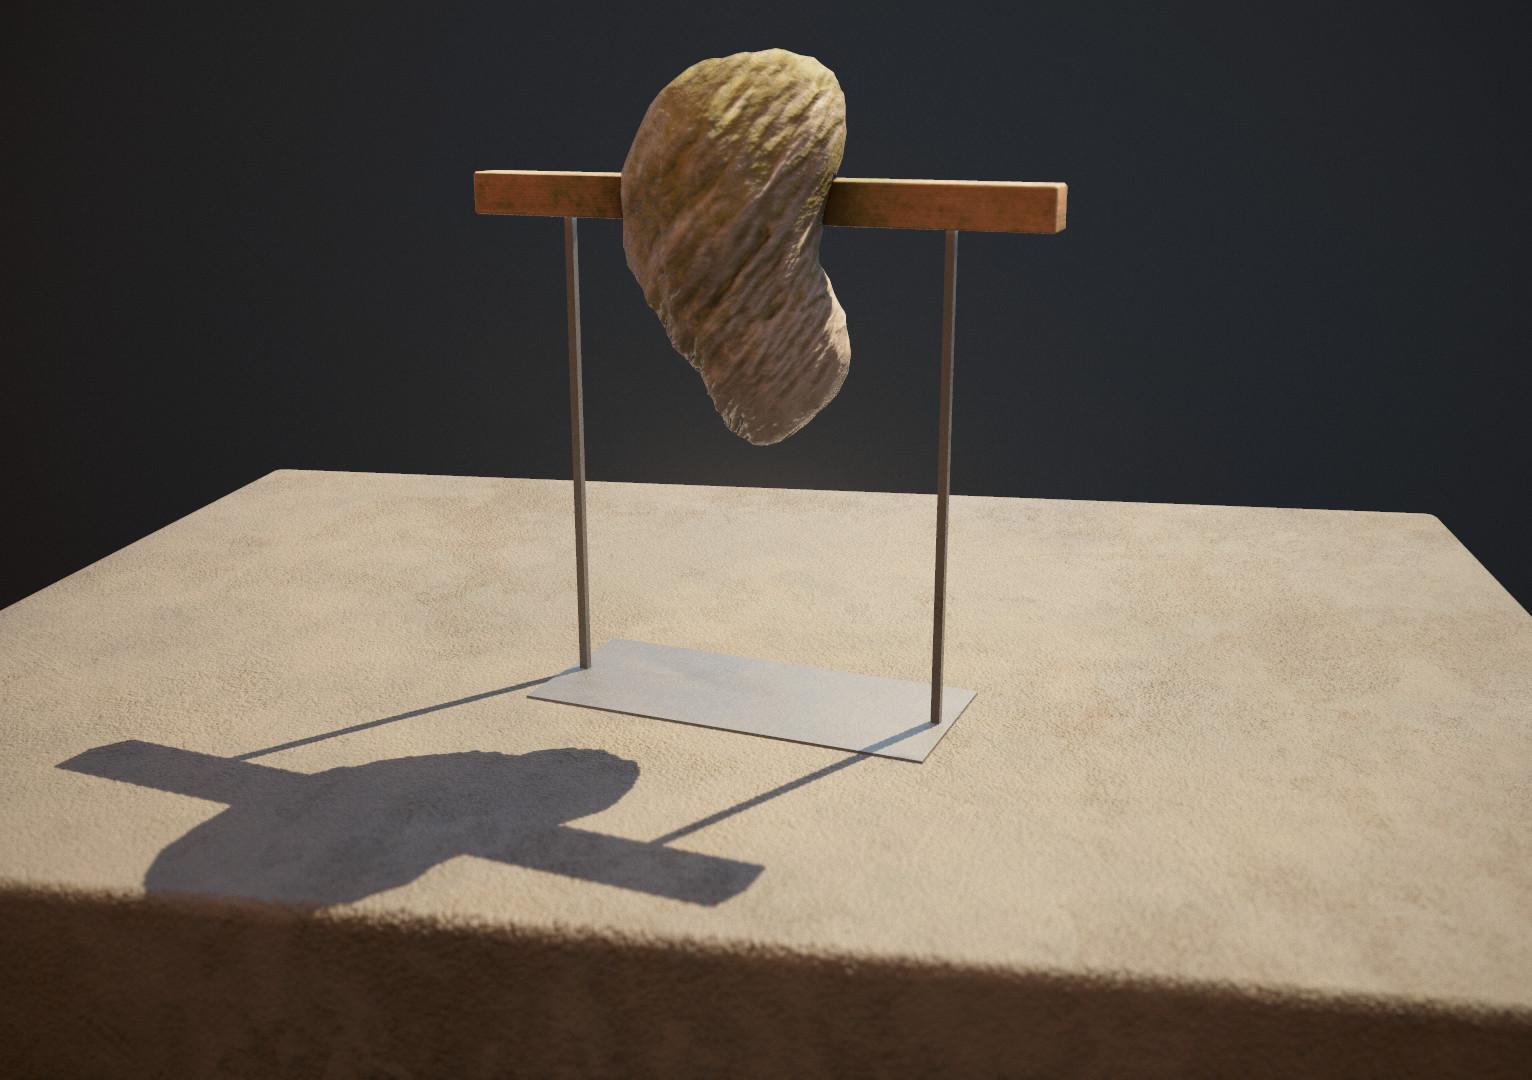 Stone of Spiritual Understanding, orig. by Isamu Noguchi.